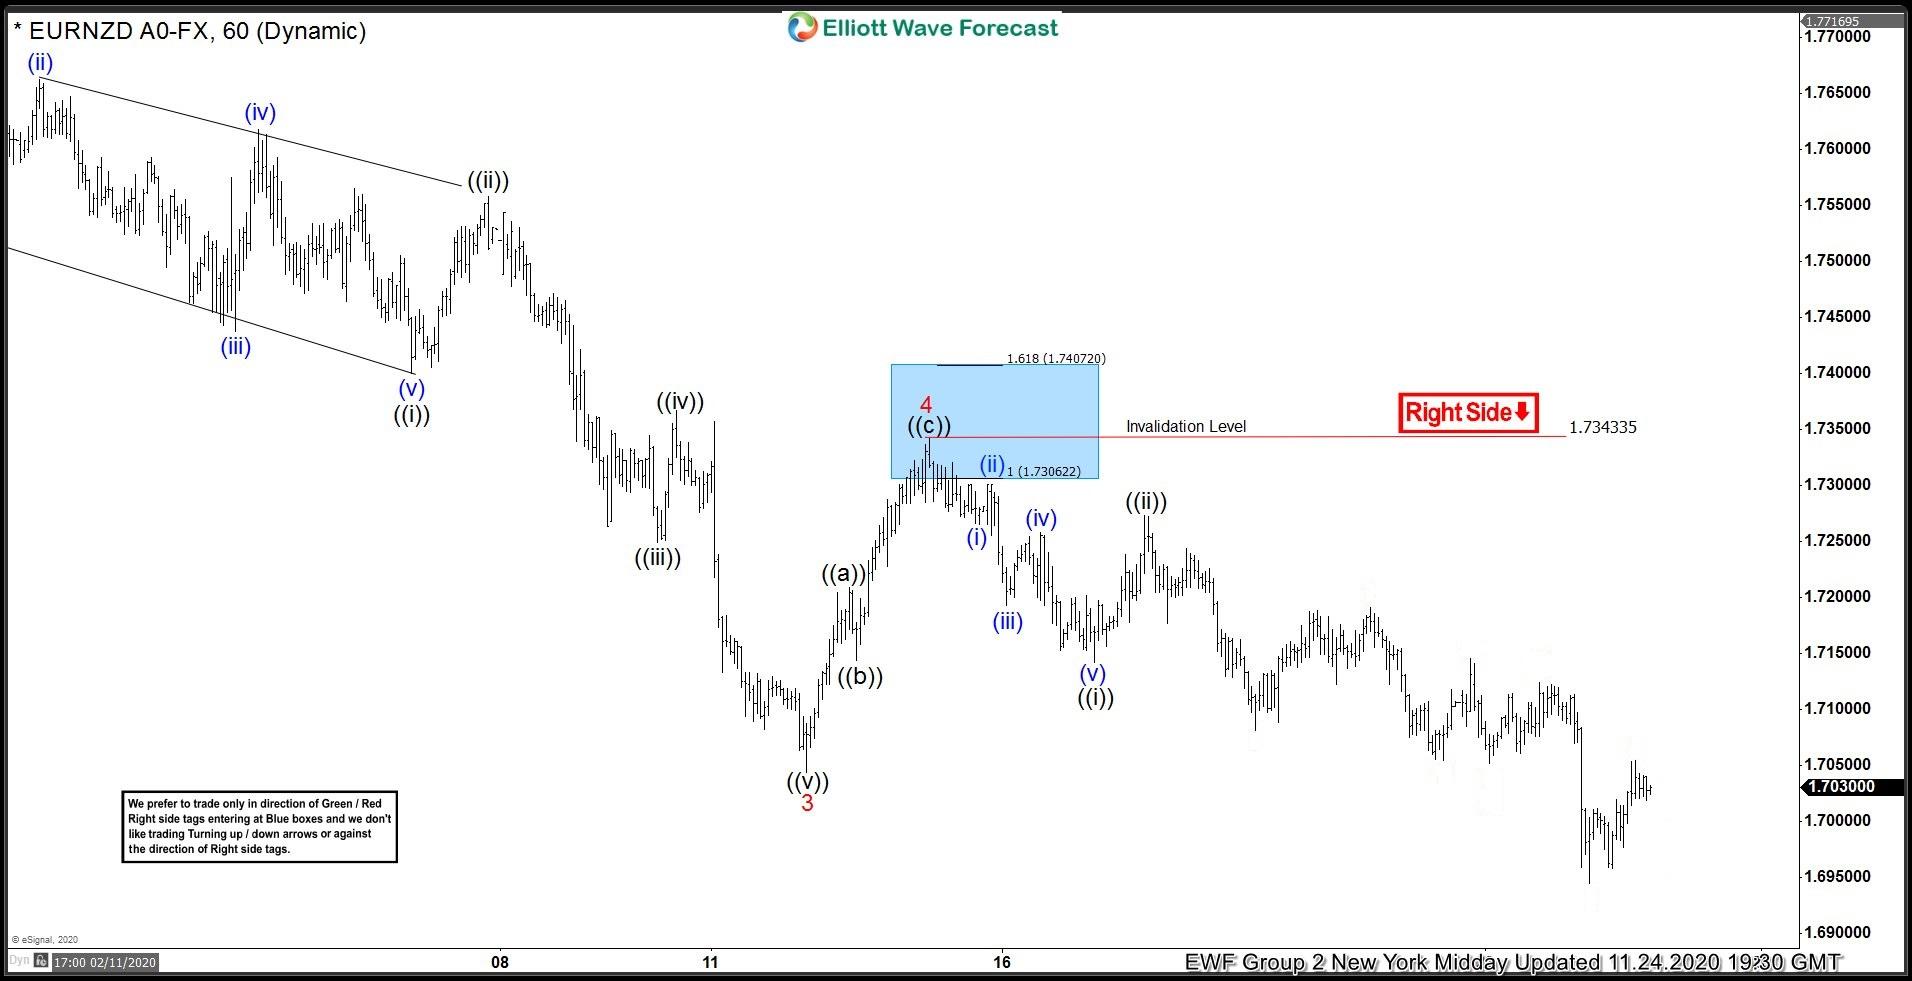 EURNZD 24 November 1 Hour Elliott Wave Analysis